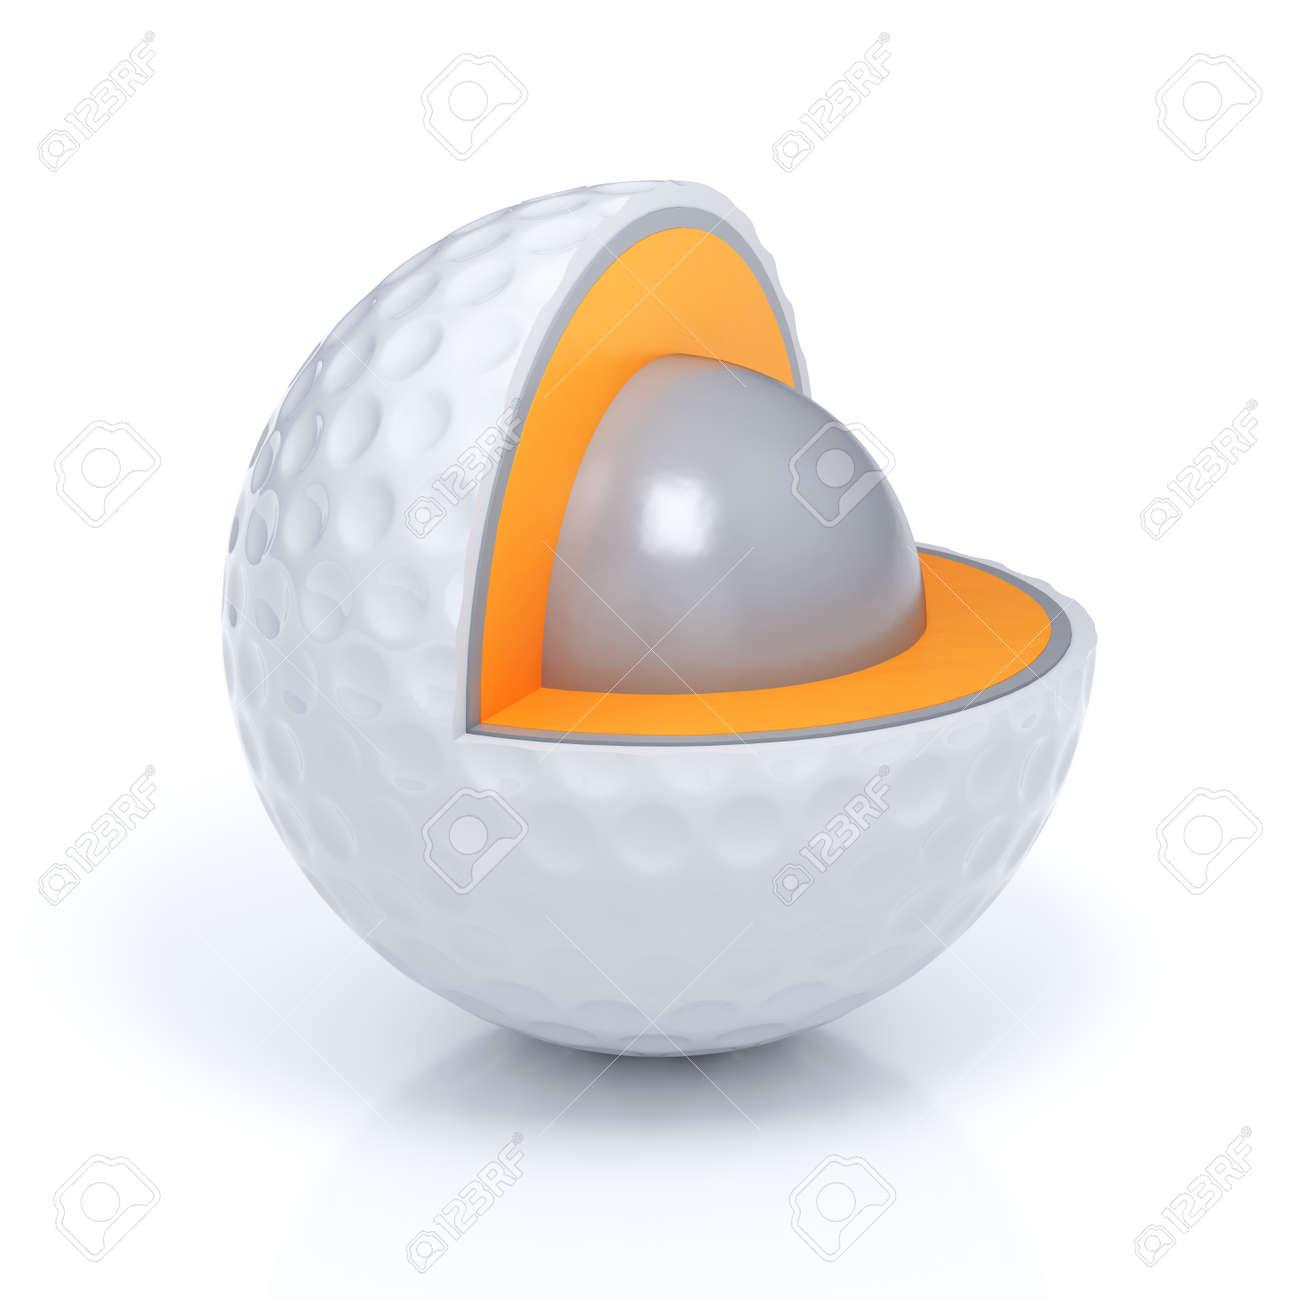 Resultado de imagen para pelotas de golf capas